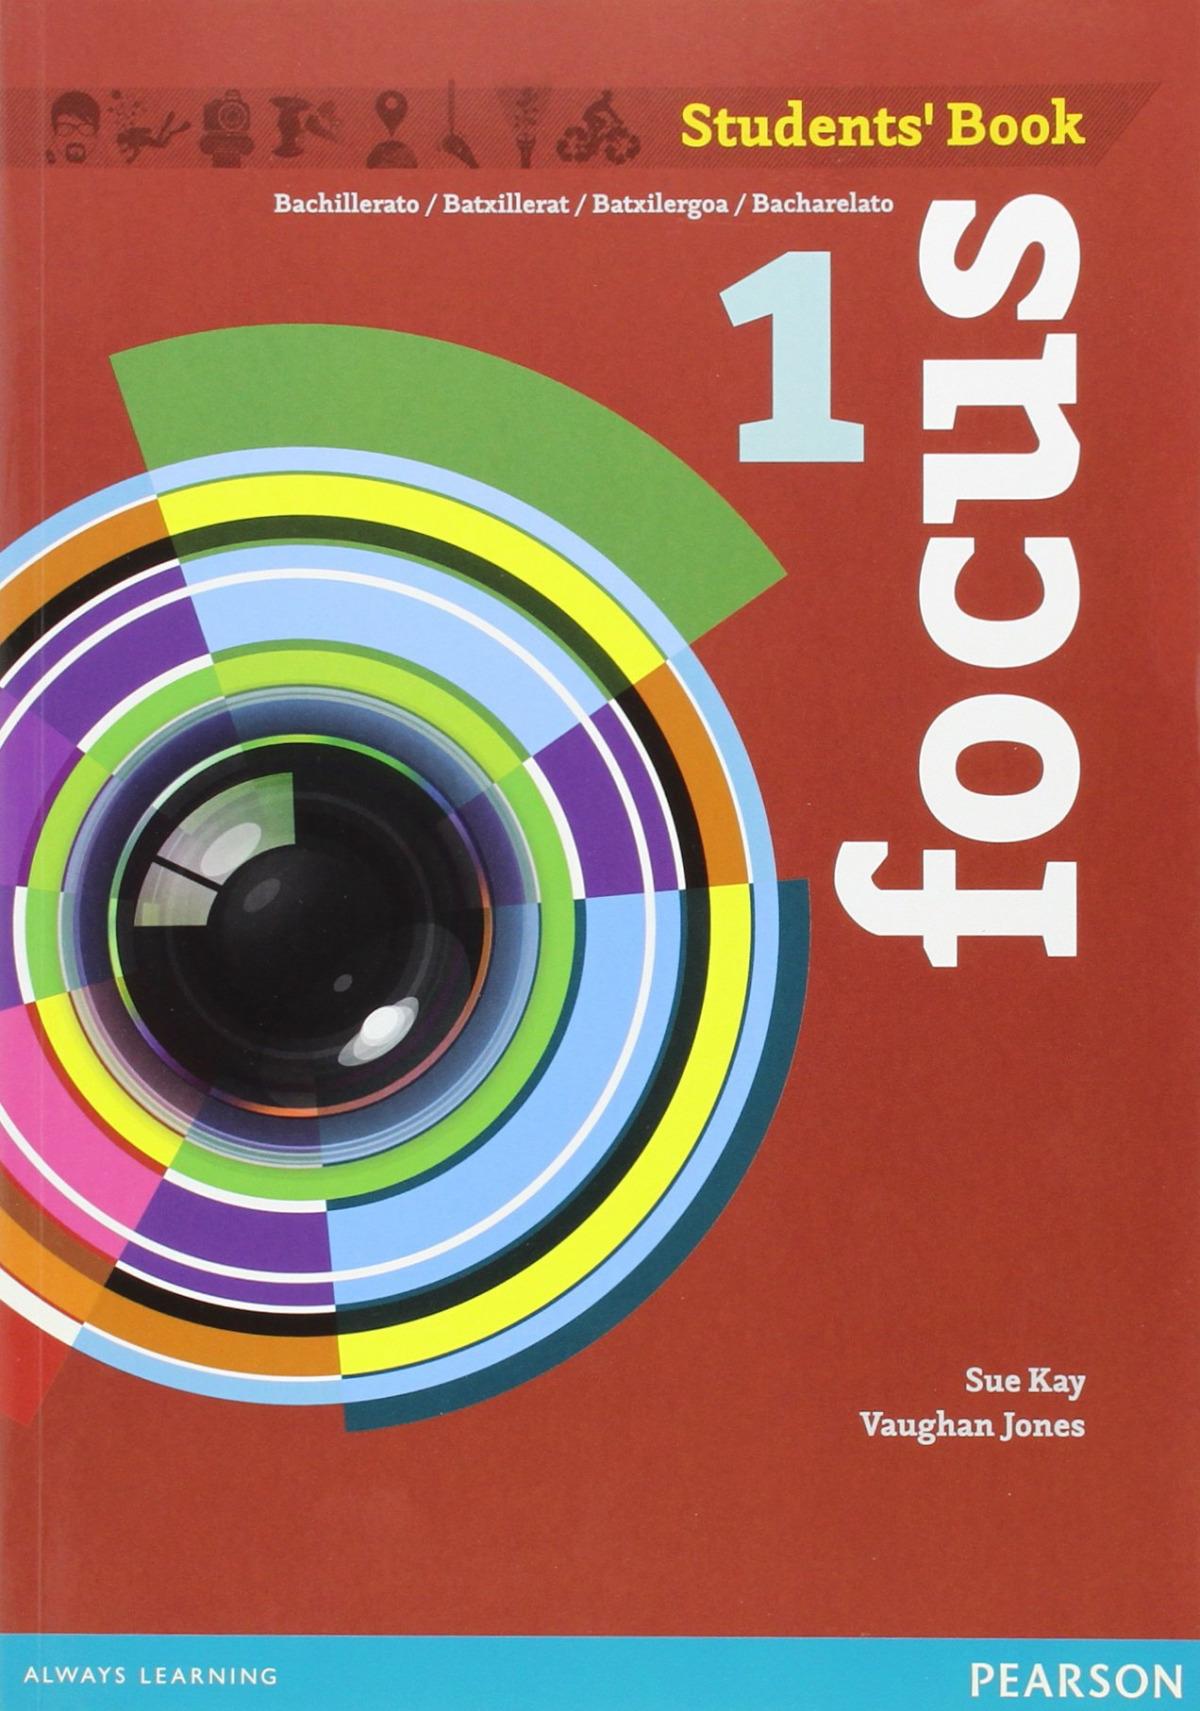 Focus spain 1ºbachillerato. Student's book